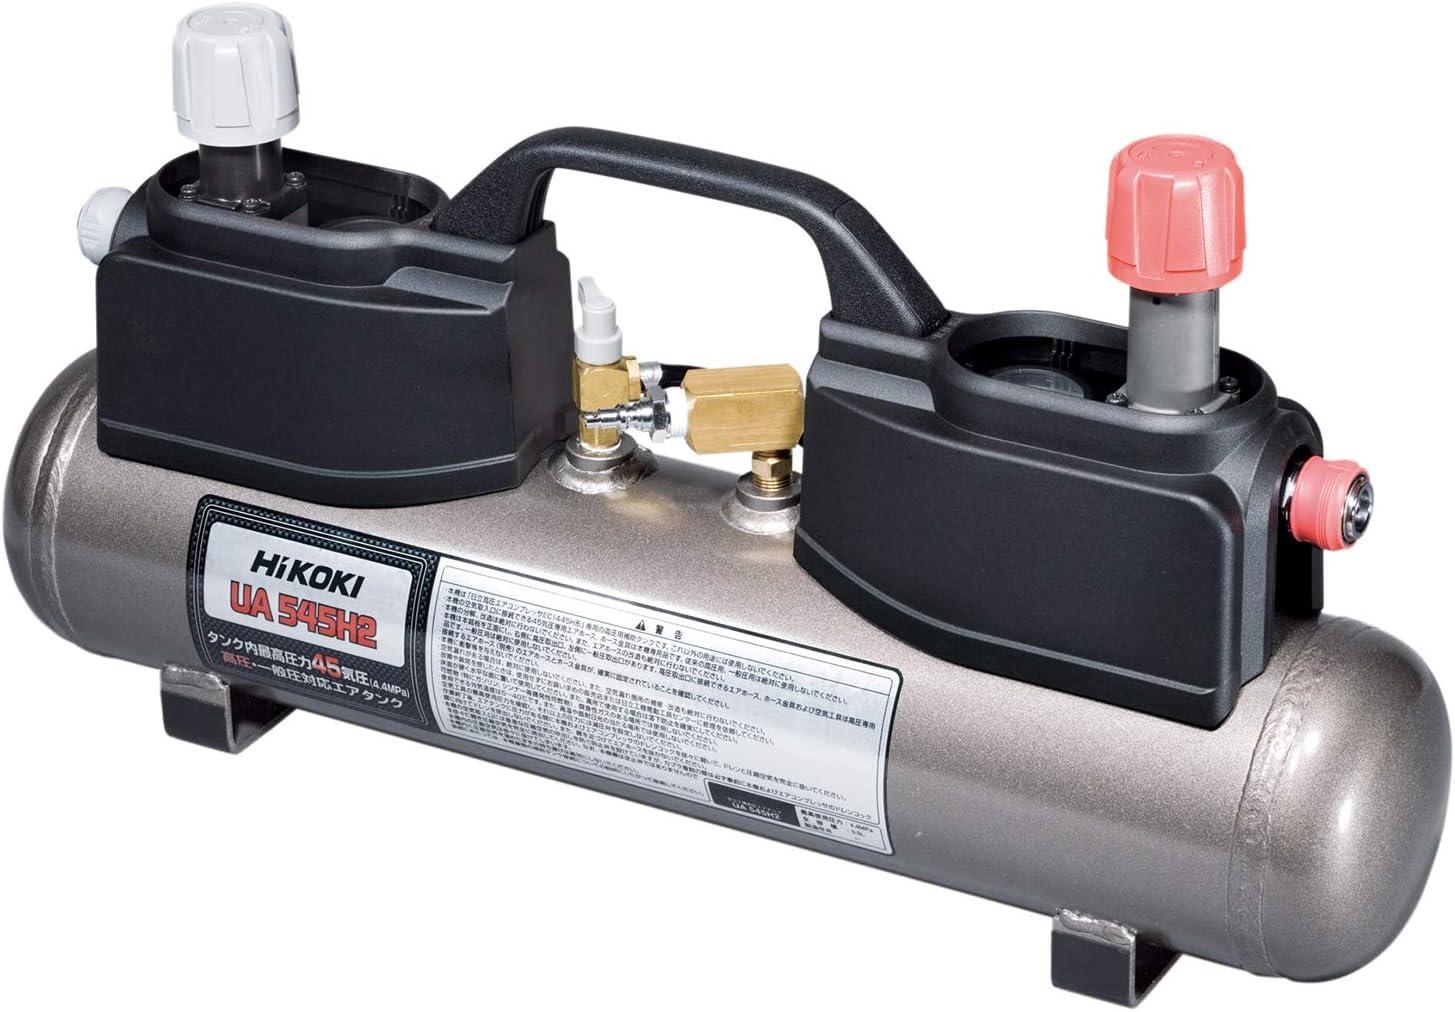 HiKOKI エアタンク 補助タンク 高圧/一般圧対応 5.5L 45気圧専用メスカプラ付 UA545H2